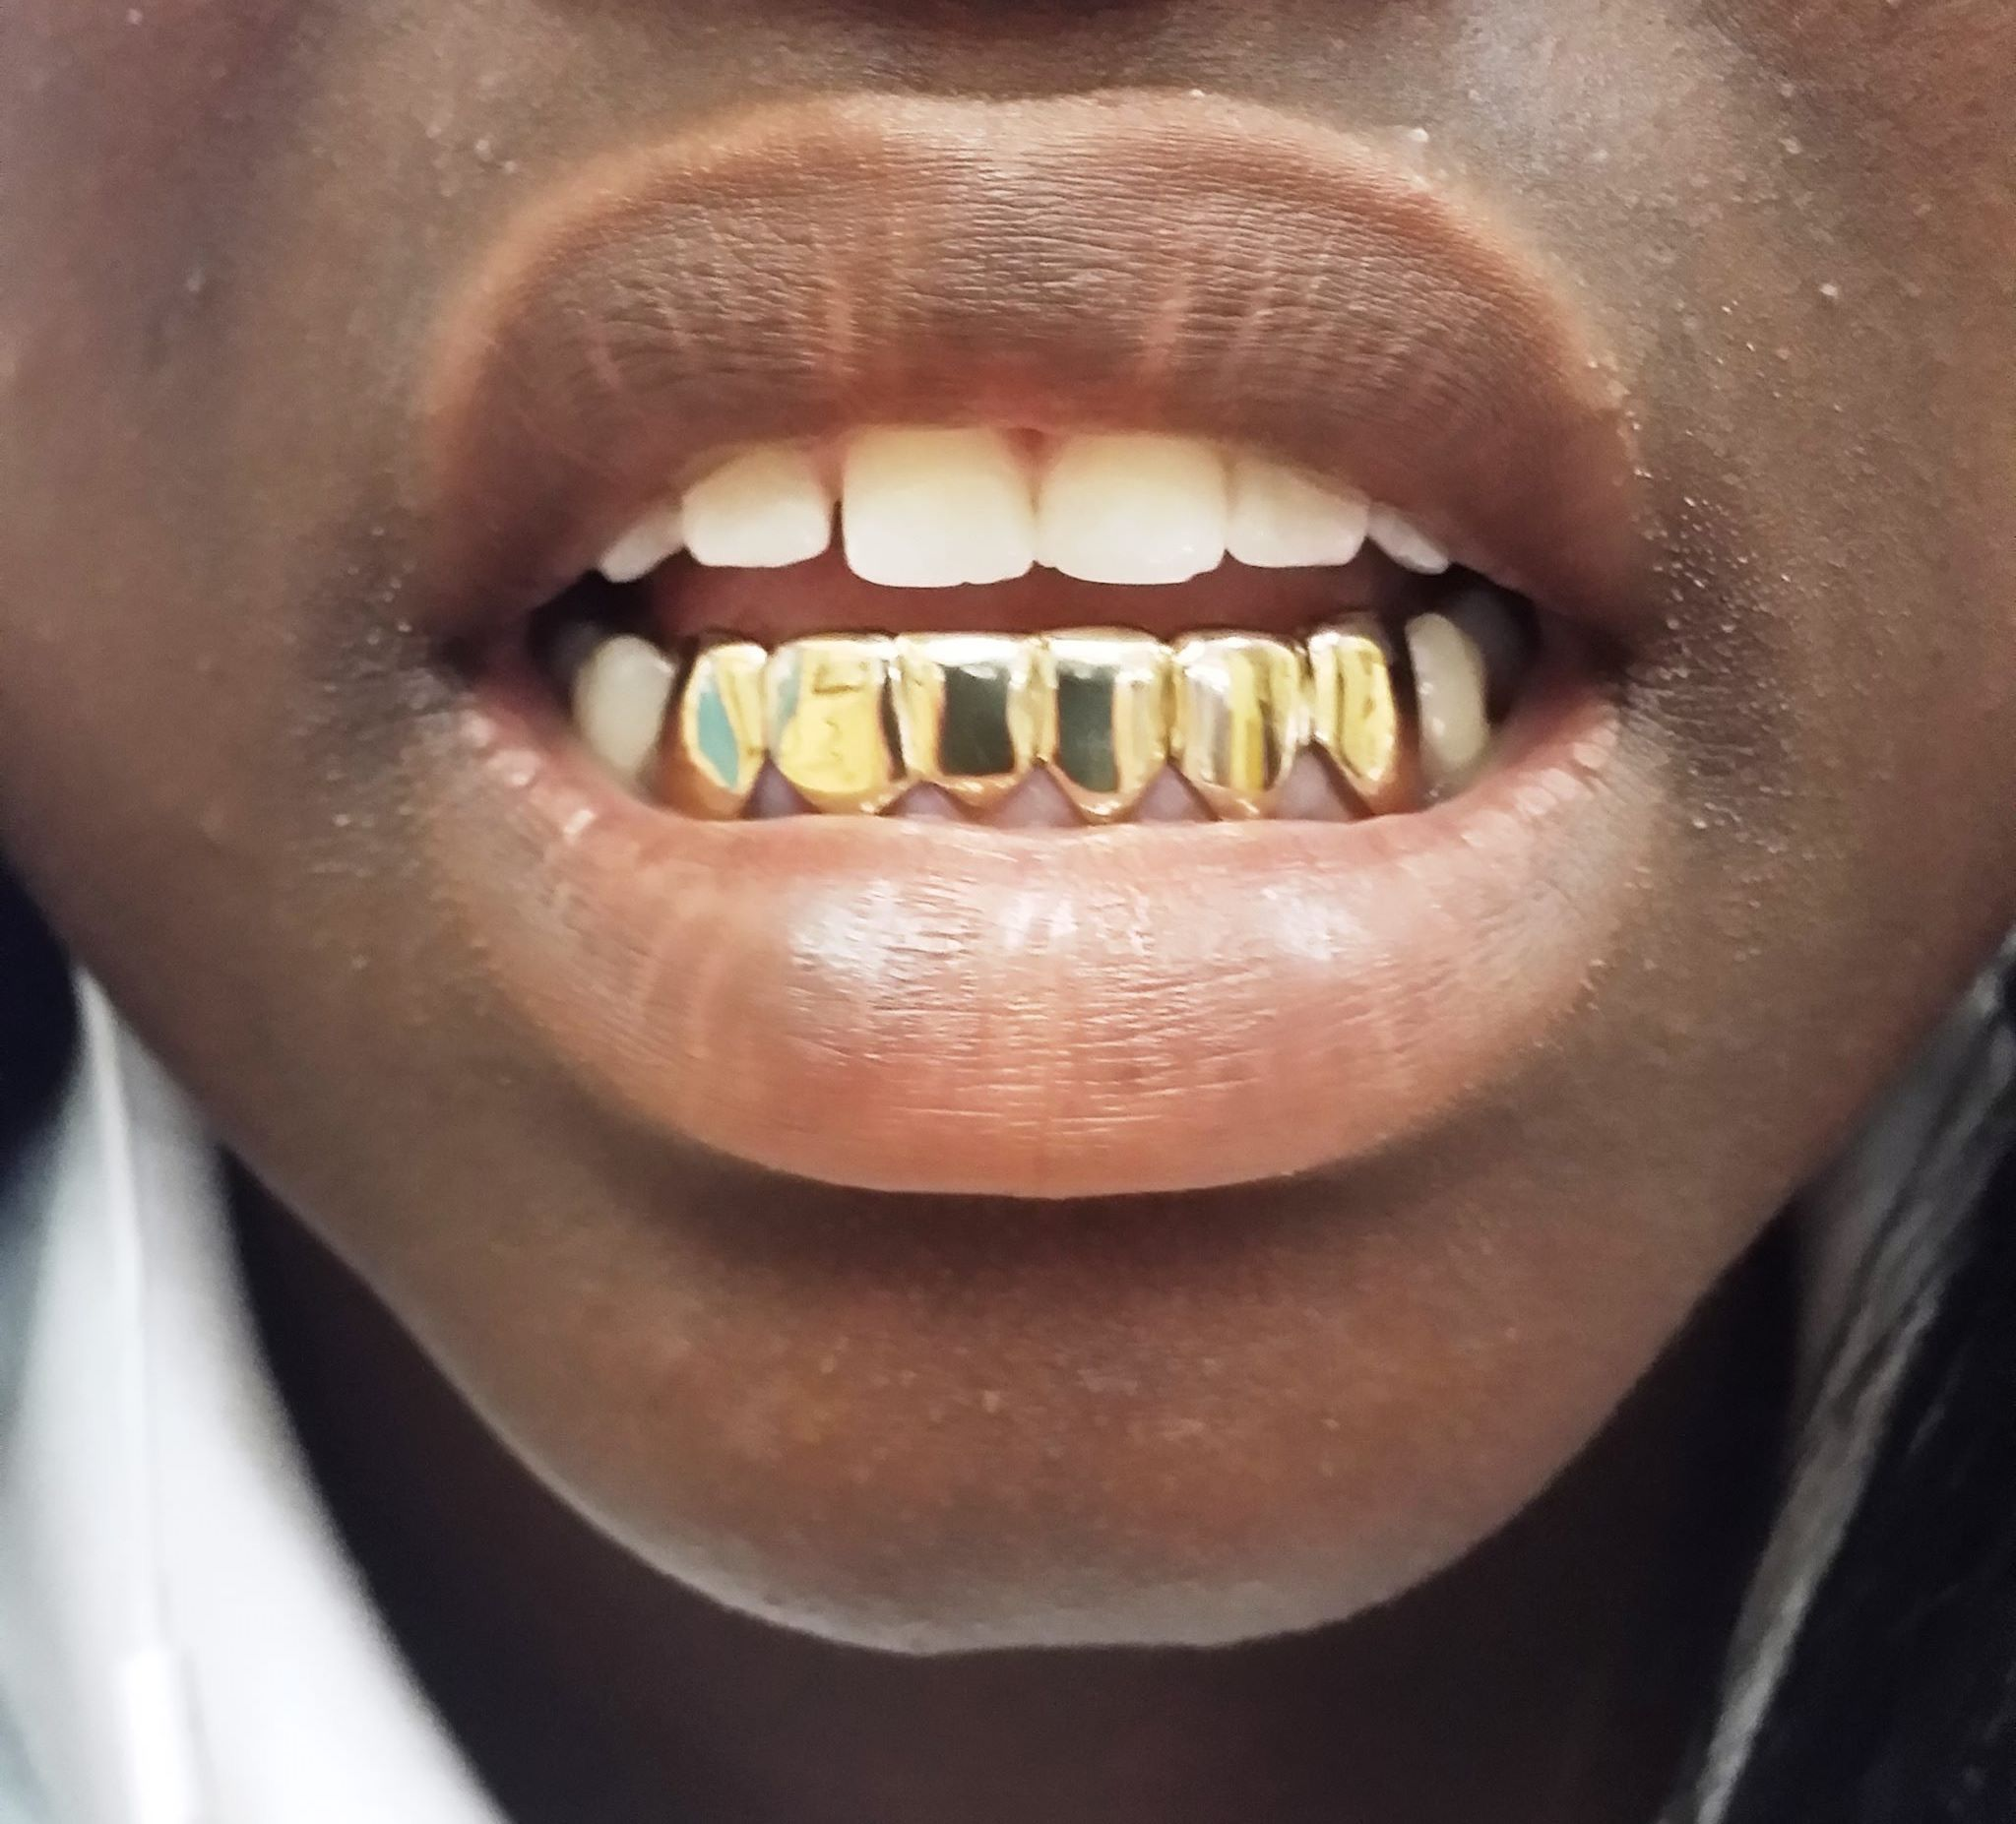 GoldGrillzMiami.com Custom Gold Grillz Yellow and White Gold Diamond Grillz  Teeth Official Gold Grillz Shop! 859e688e7